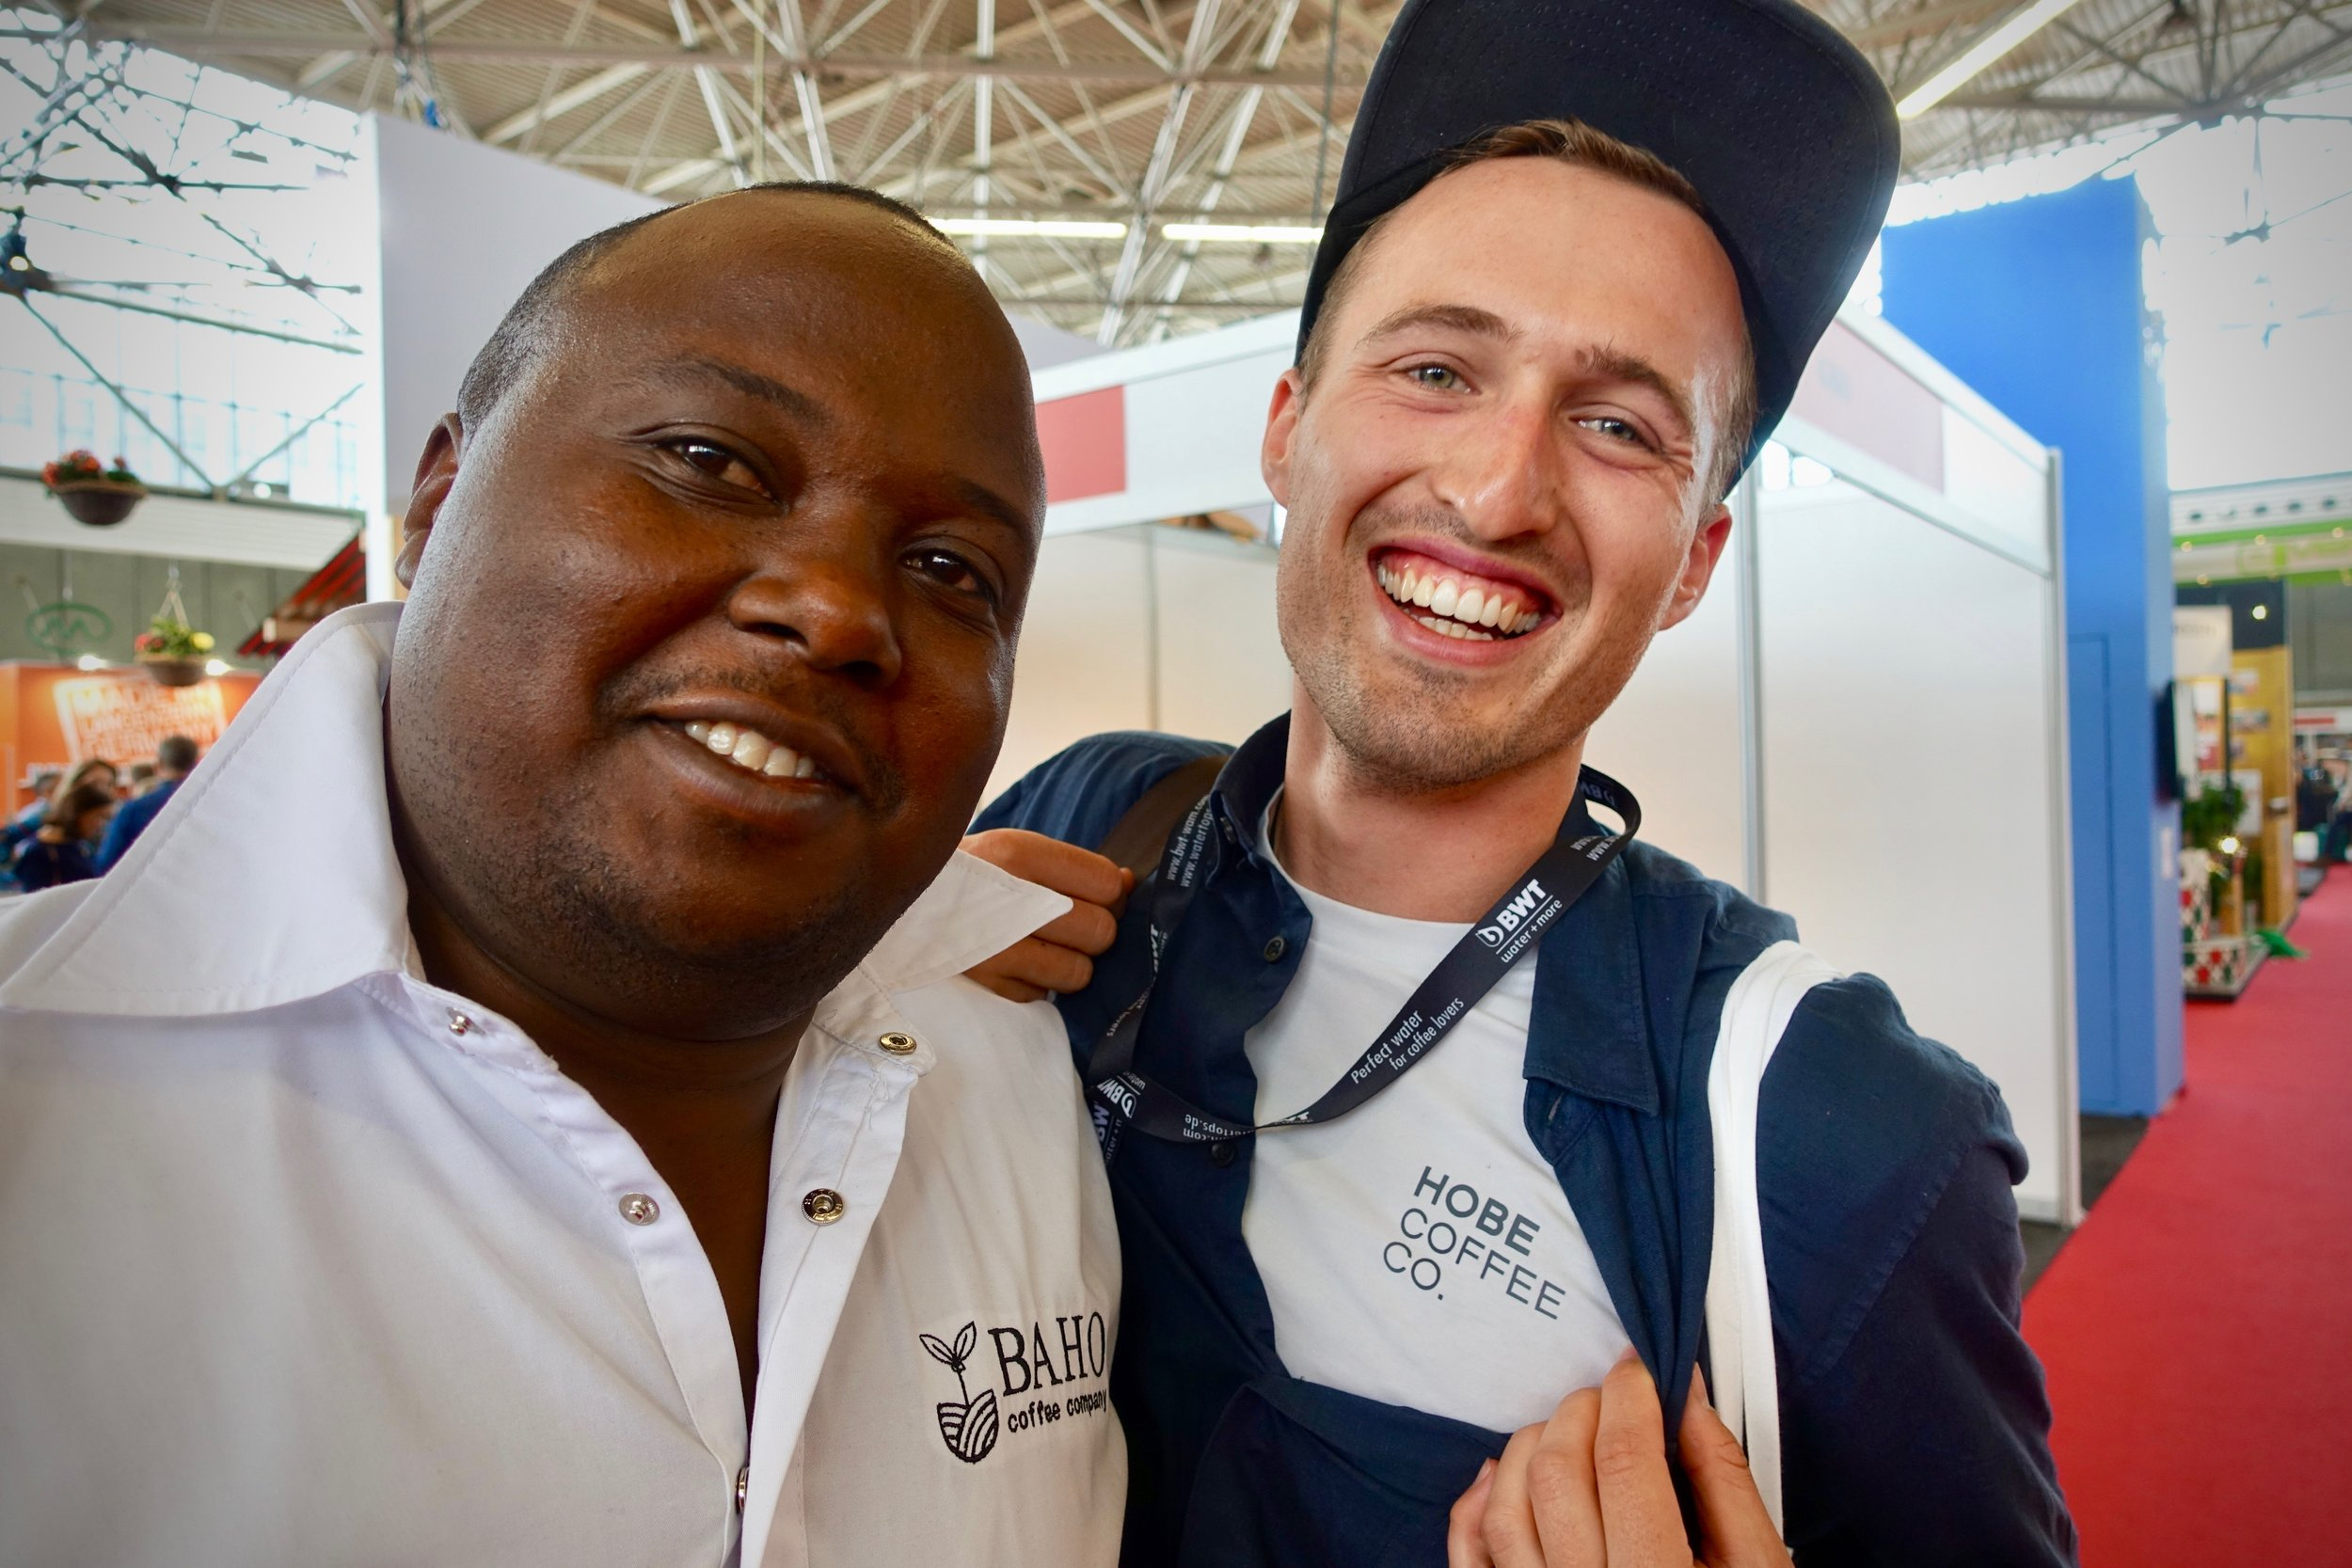 Catching up our Rwandan partners, Baho Coffee Company.